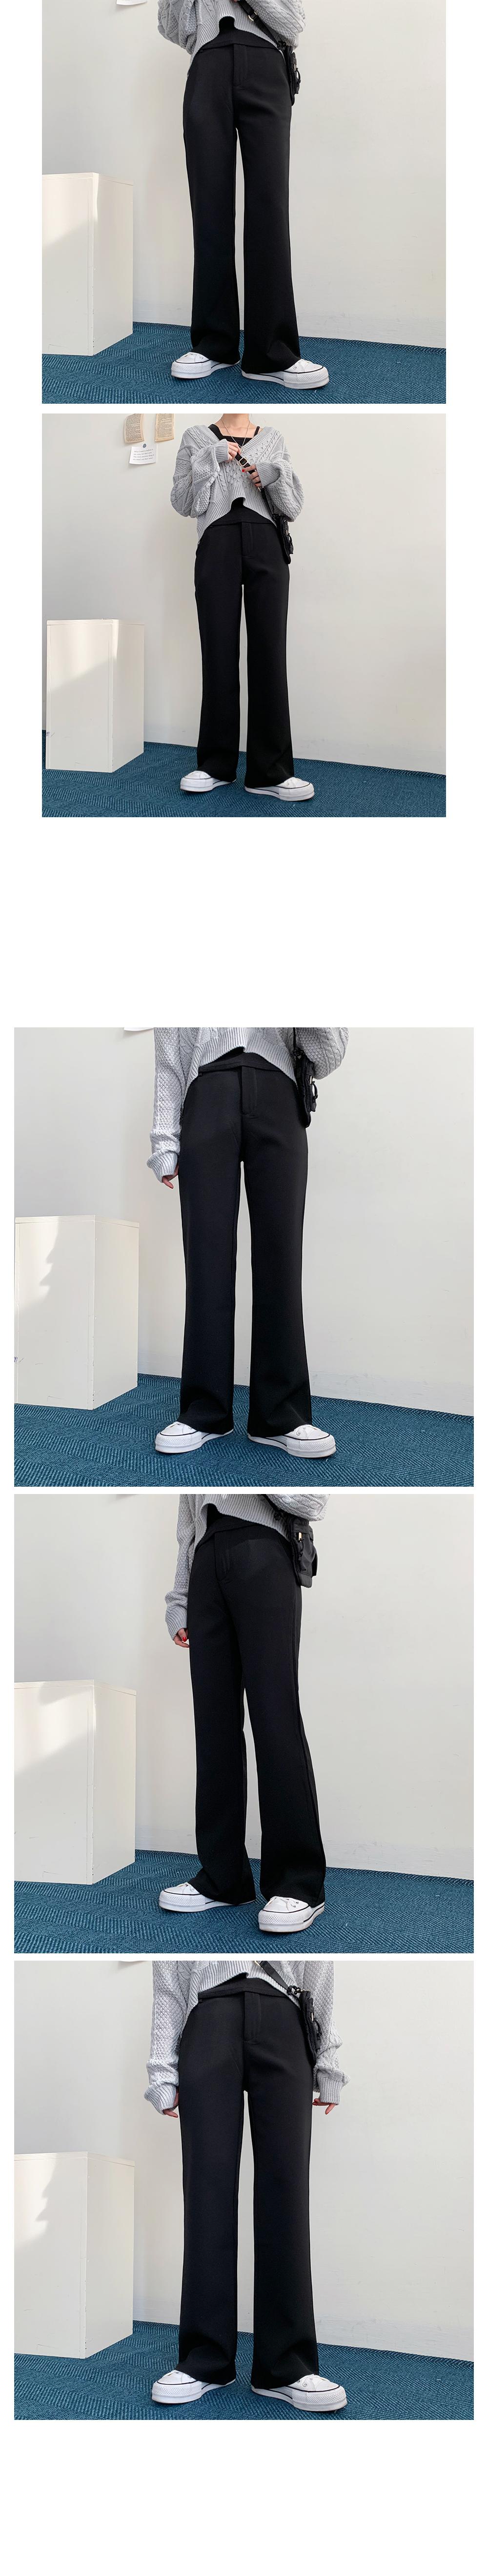 2-meter long long slacks